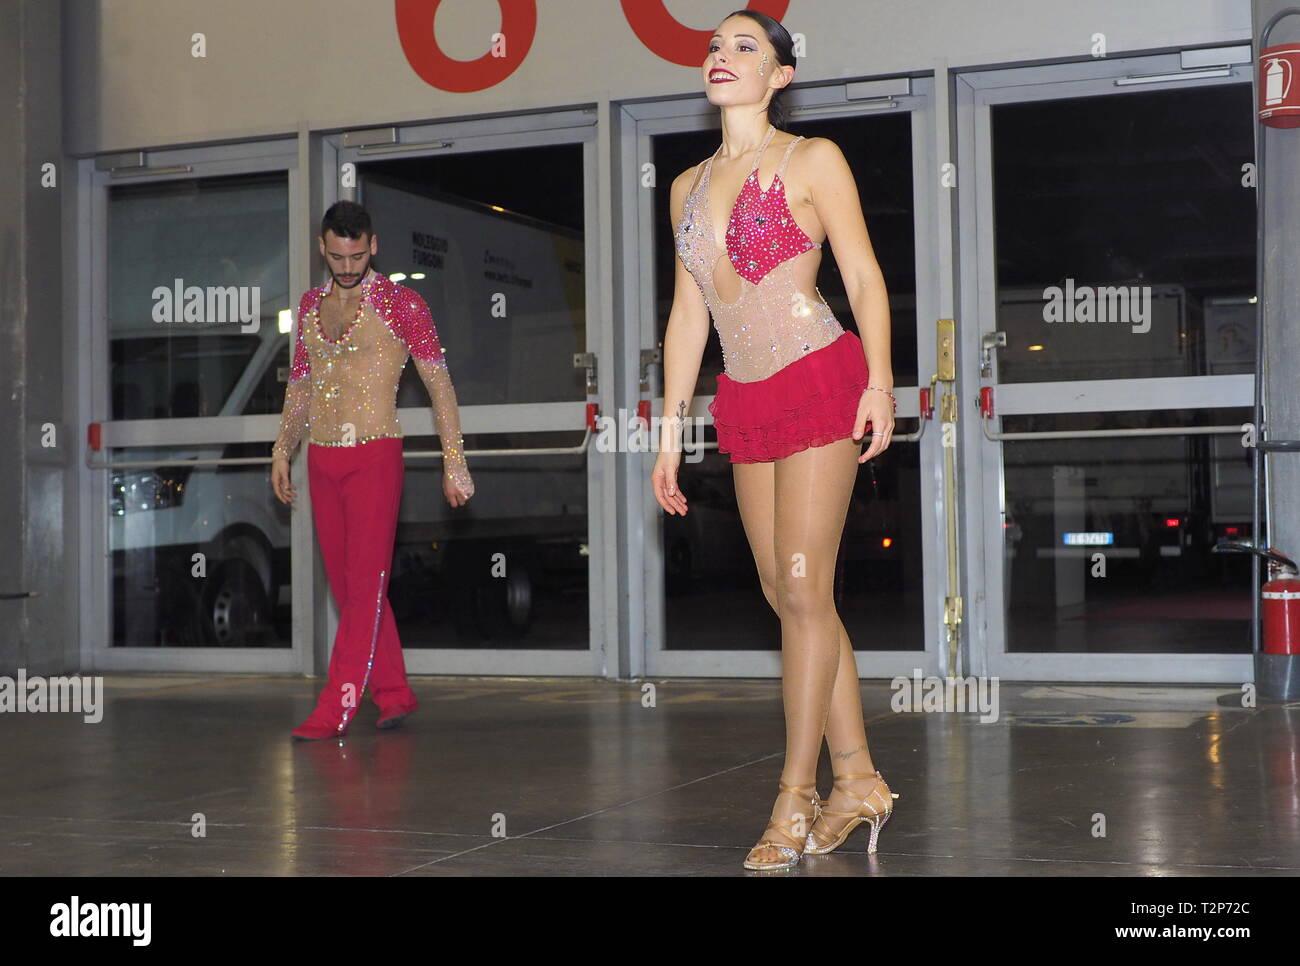 Rho, Italy 1 December 2019: Romanania dancers show during artisans fair. - Stock Image